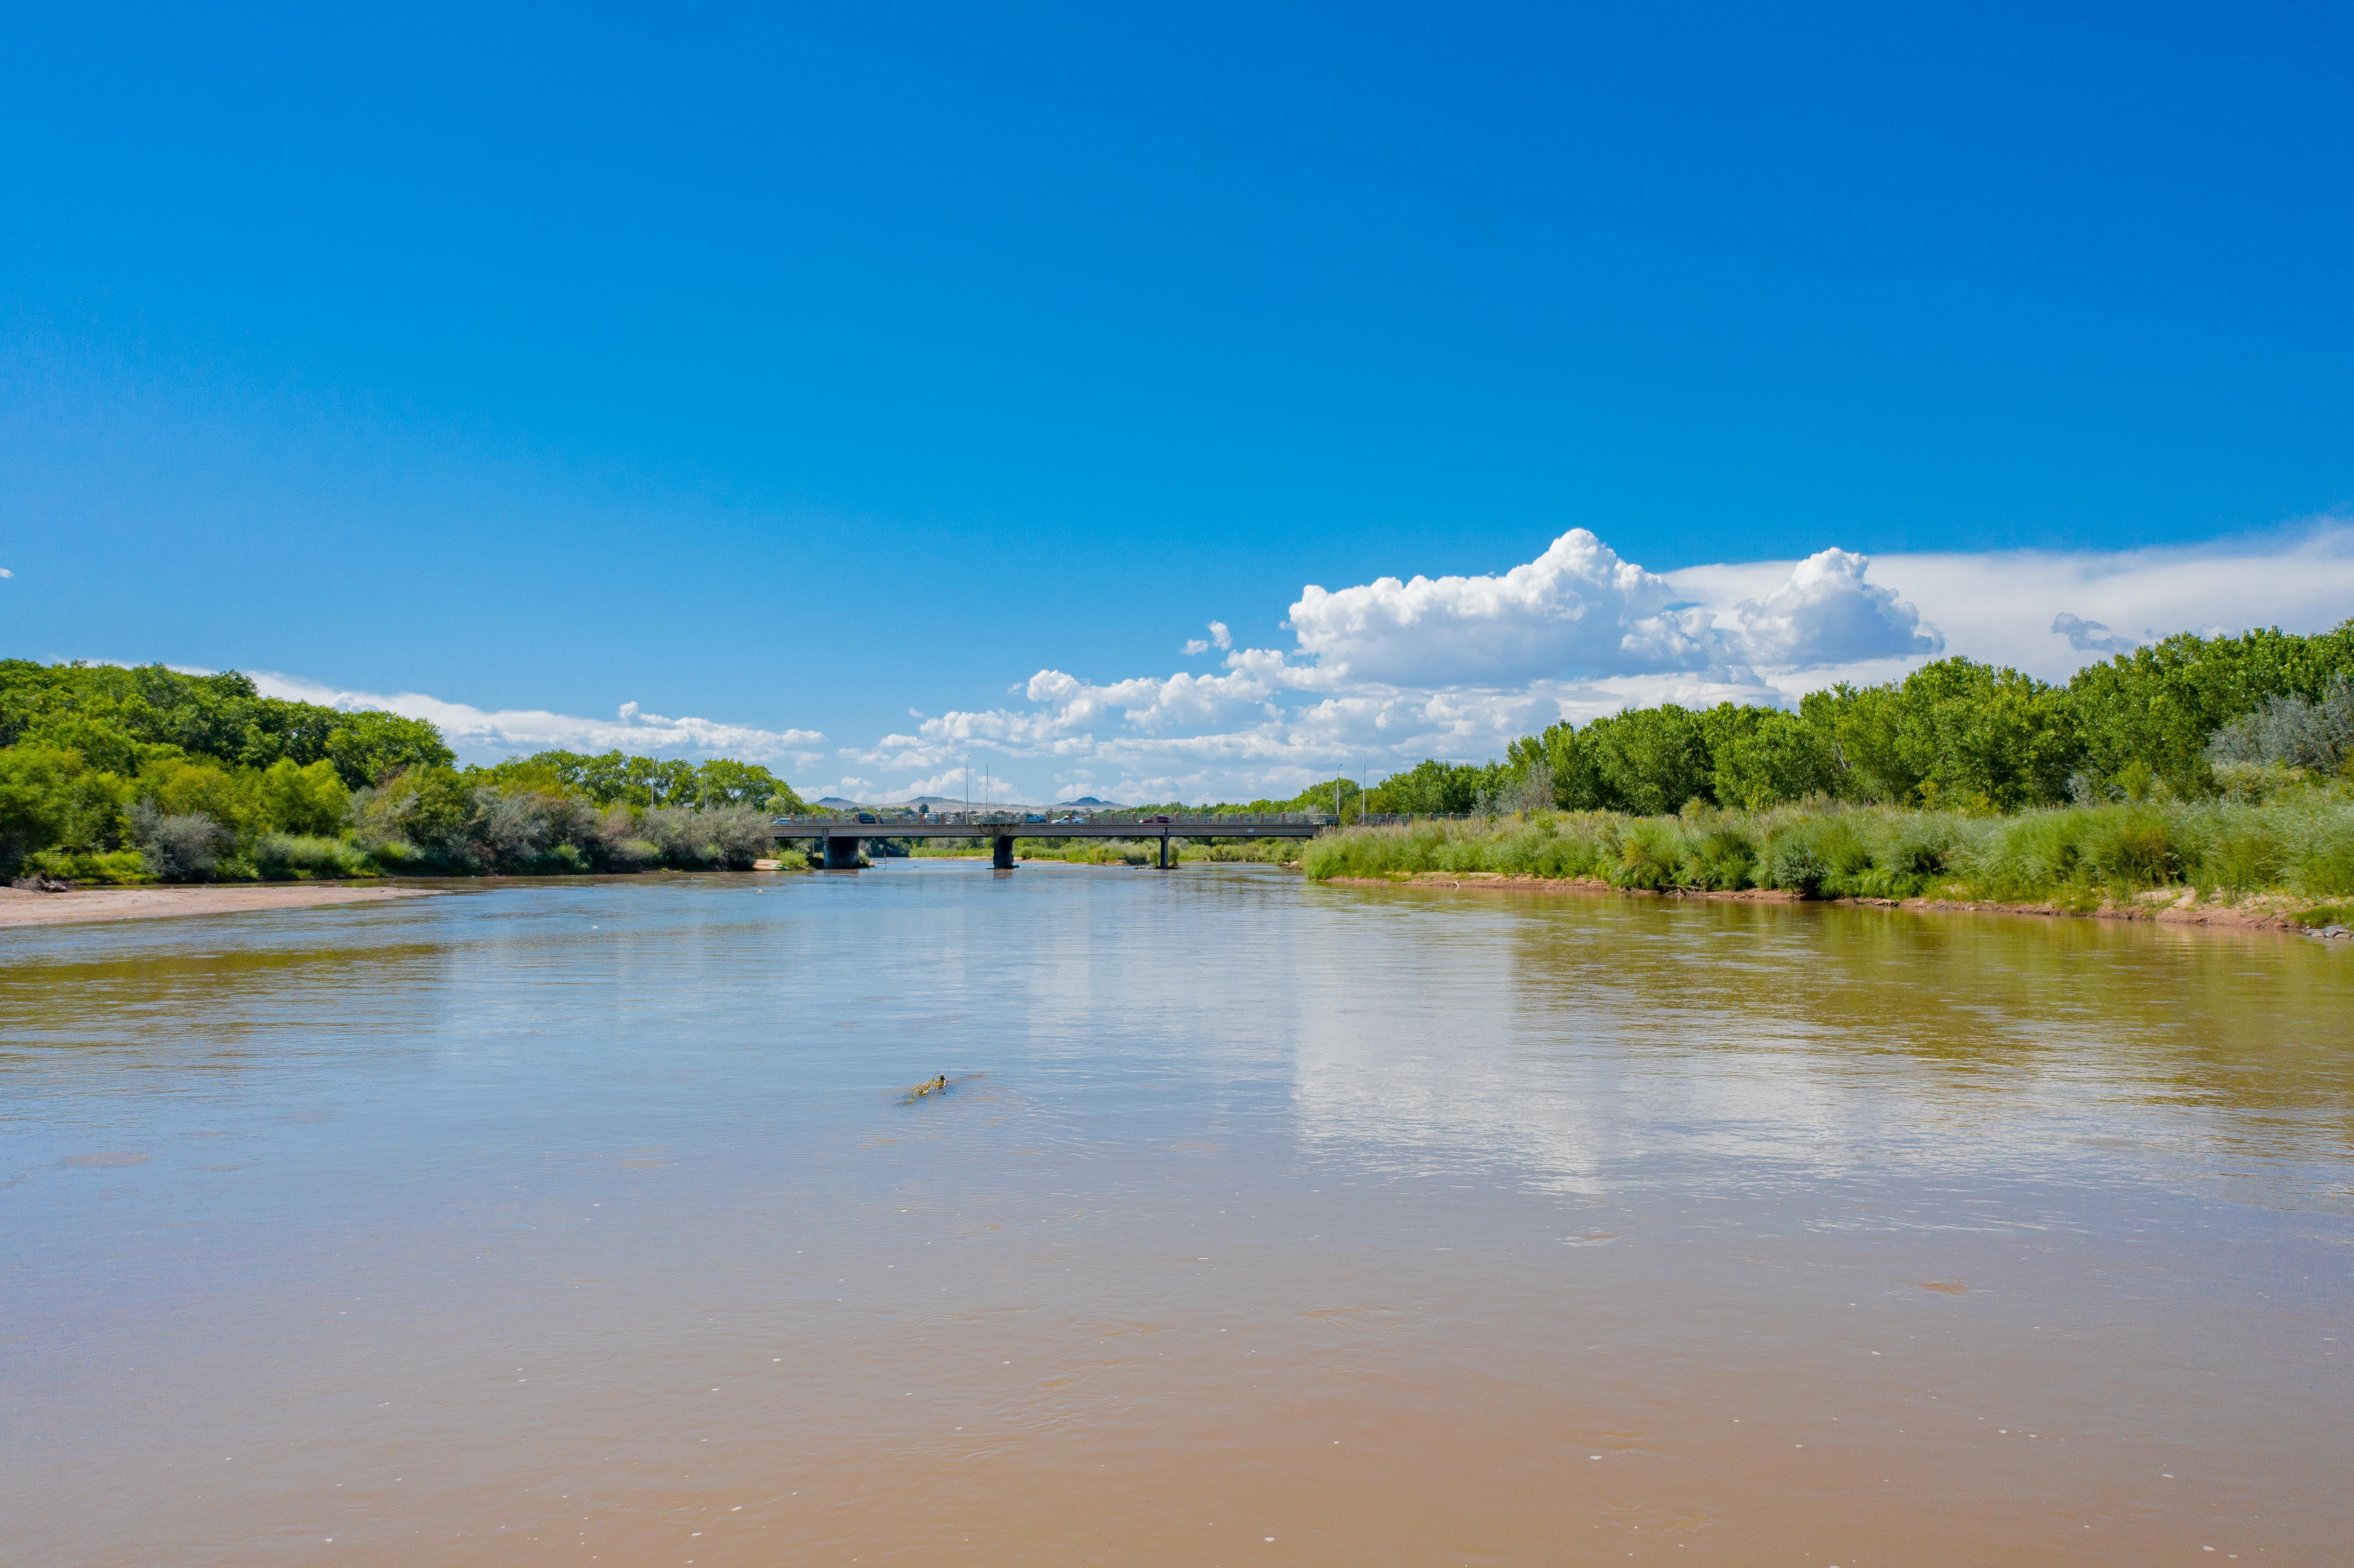 A photo of the Rio Grande.